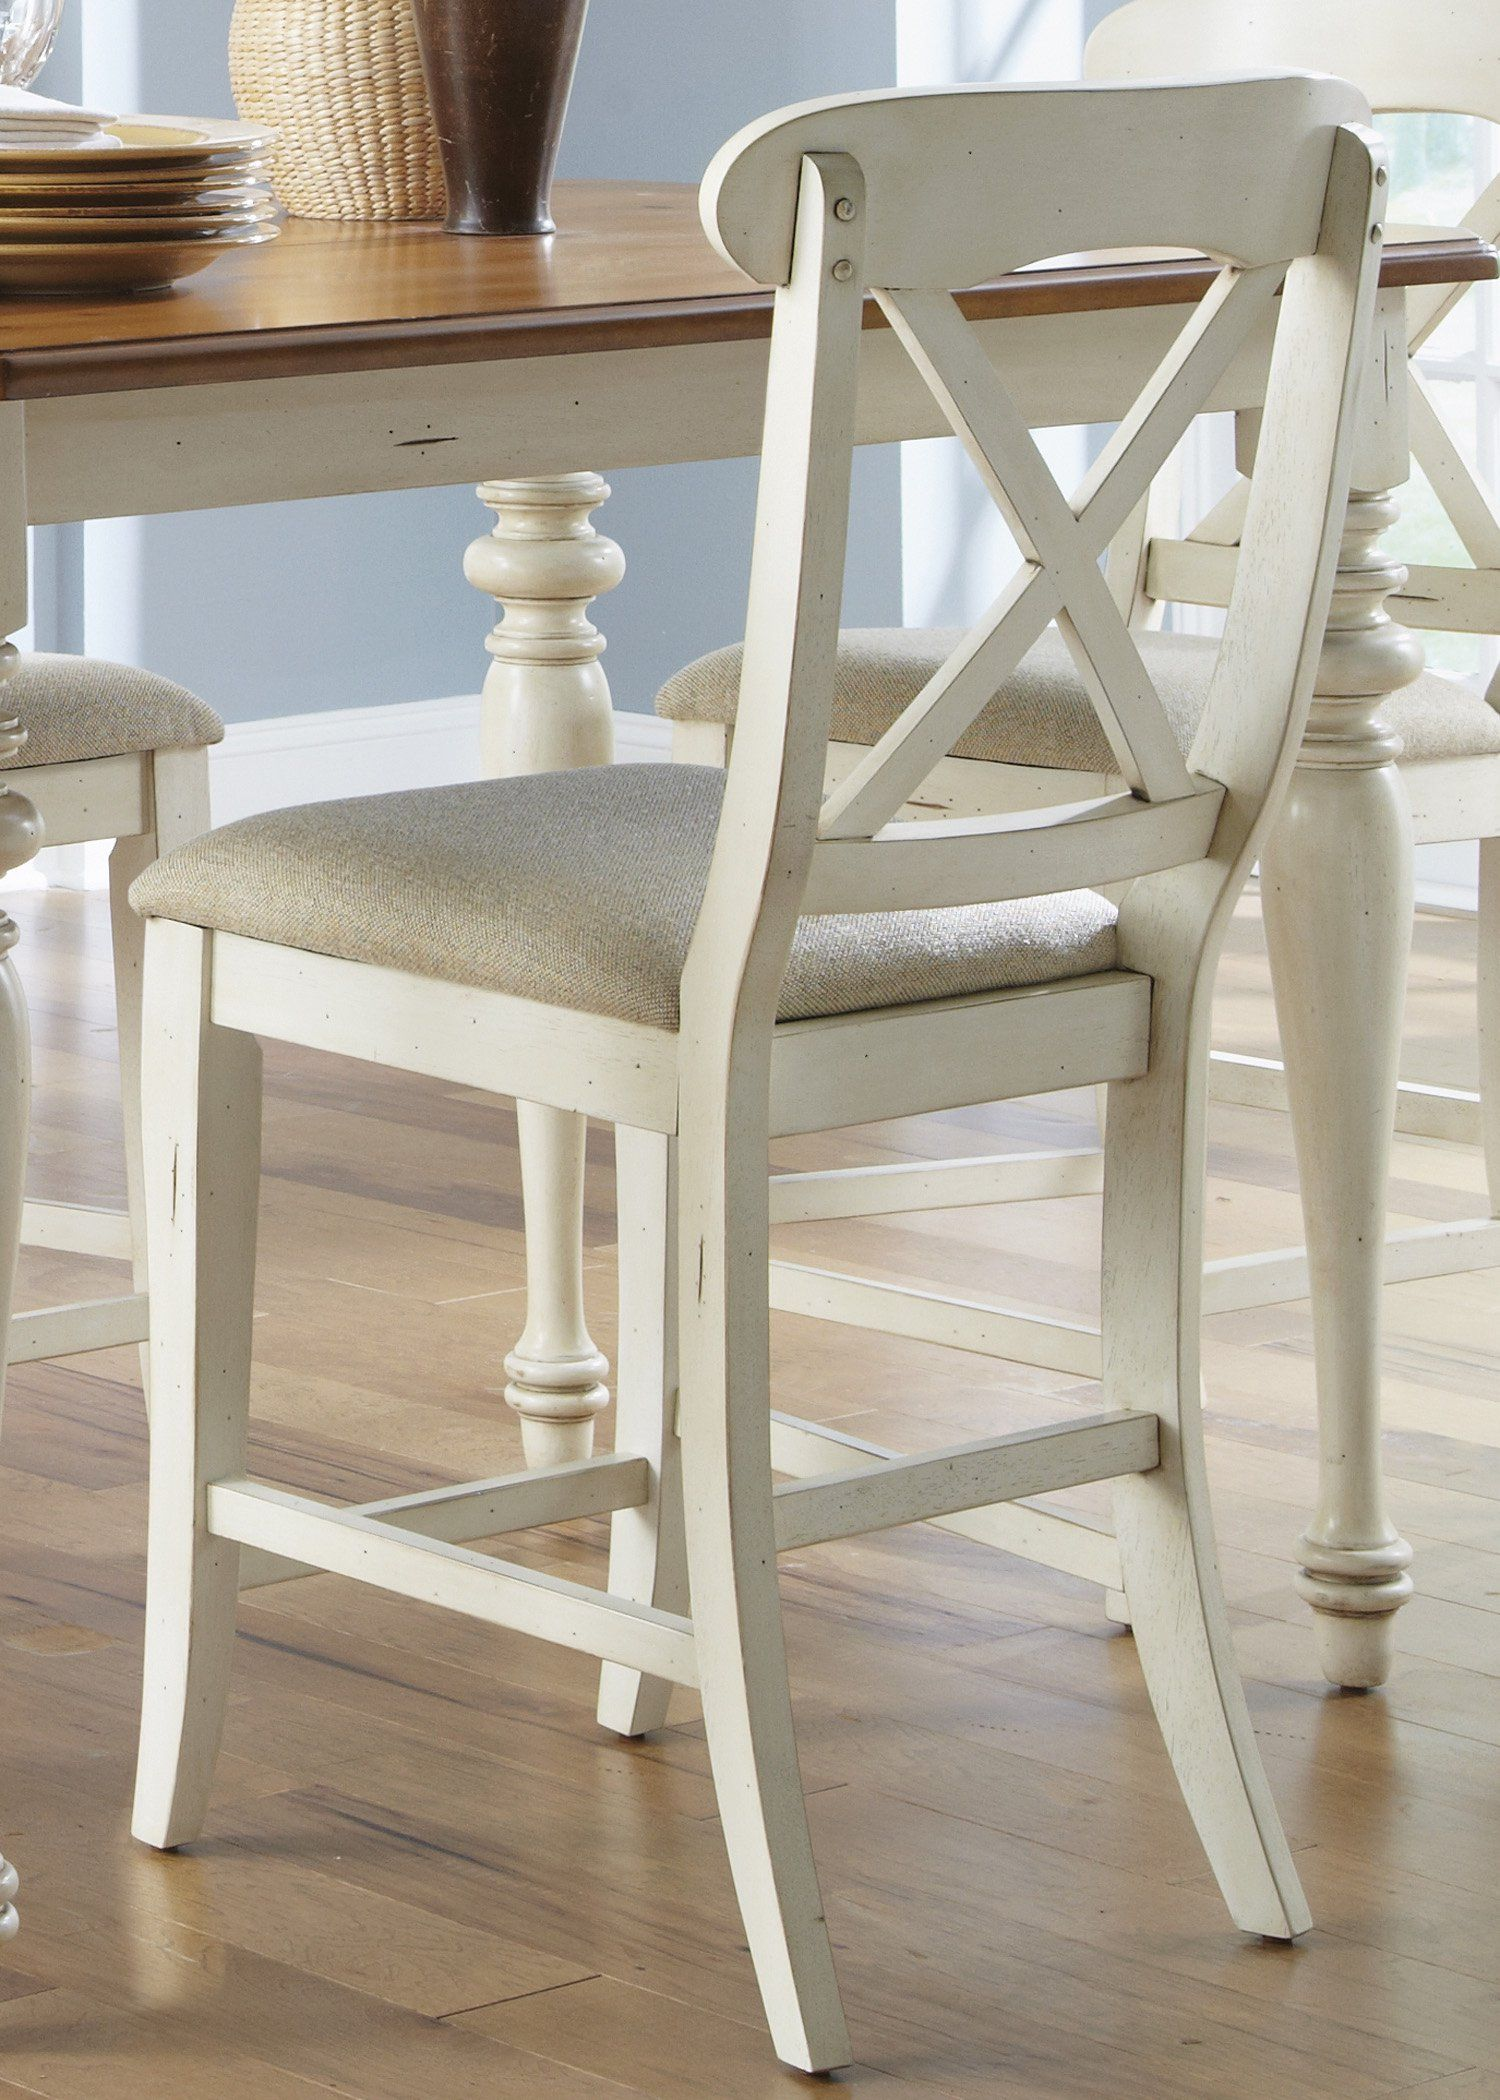 Liberty furniture ocean isle upholstered x back counter stool set of 2 308 hayneedle